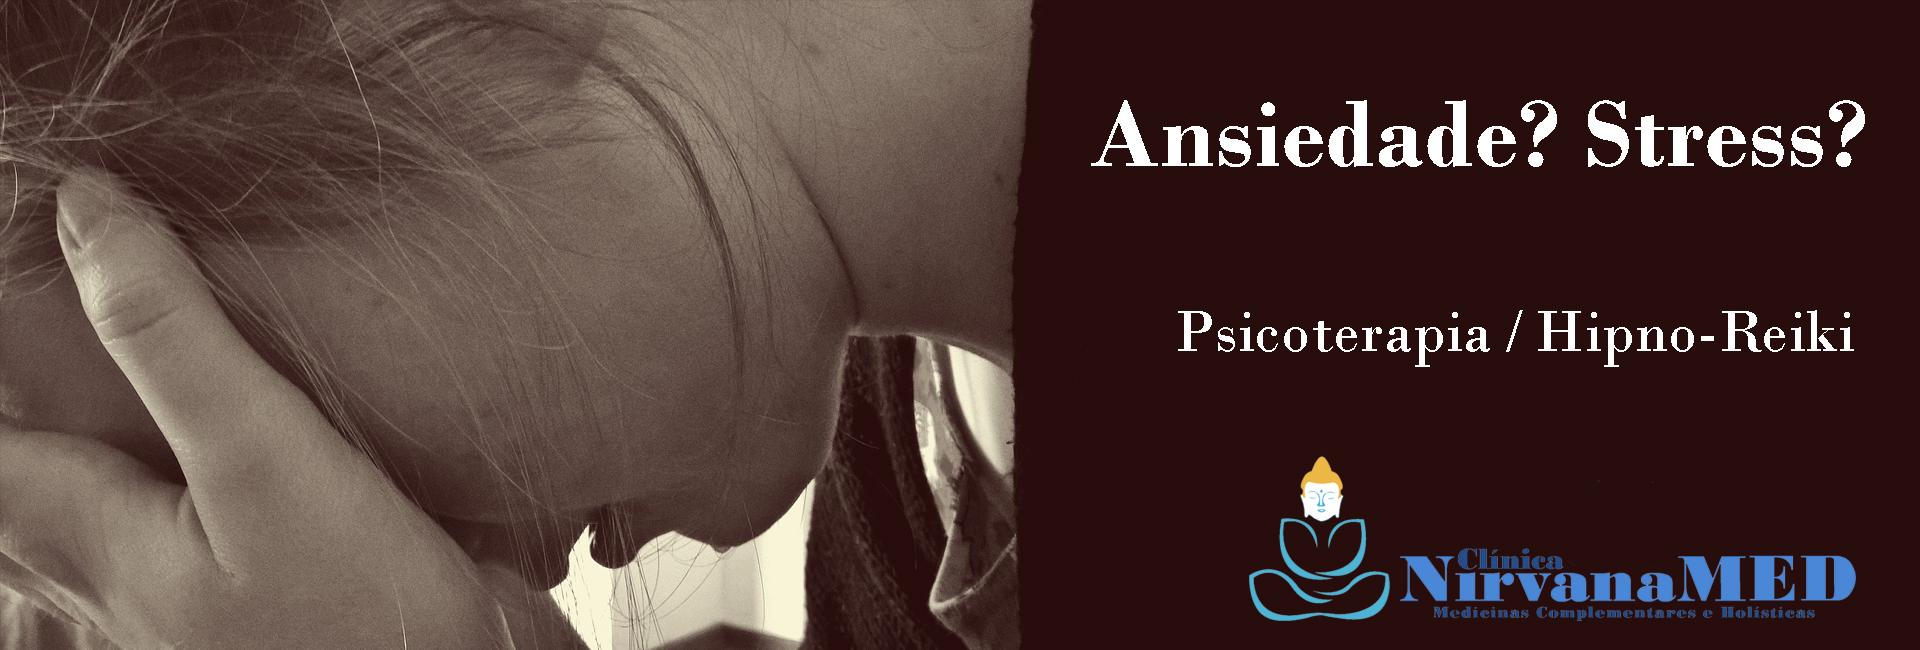 ansiedade_stress